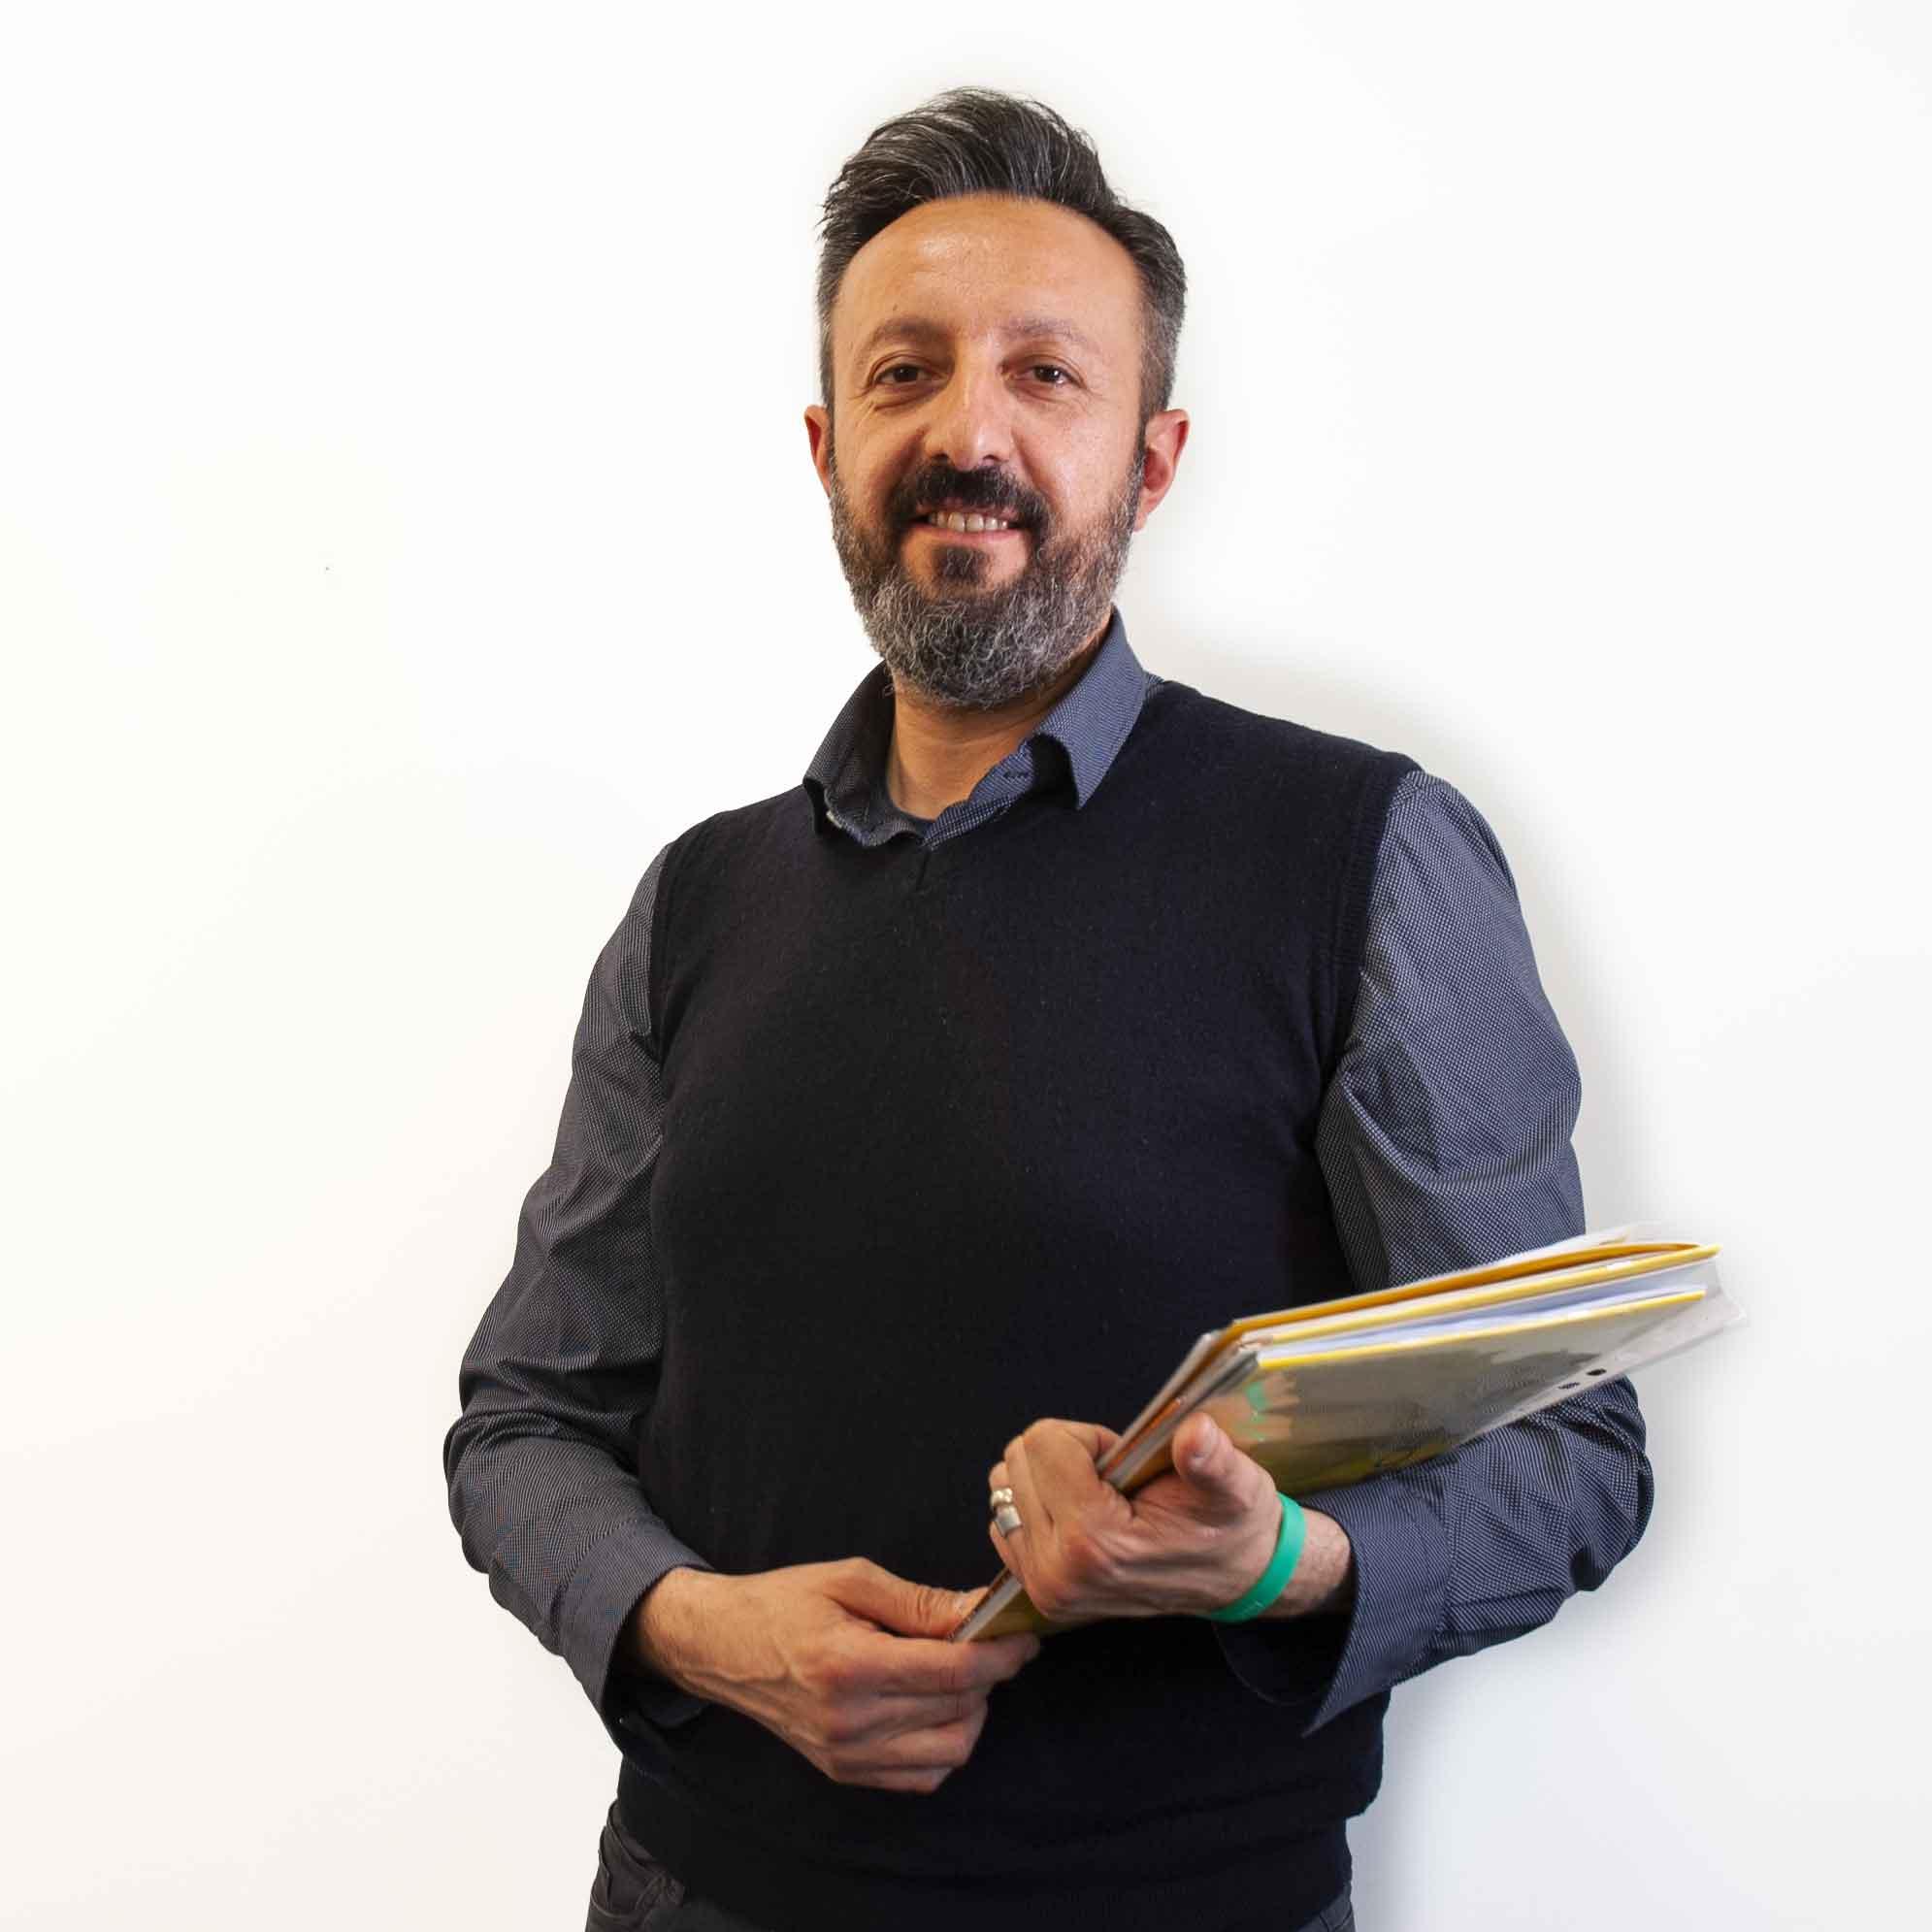 Gianluca Dossena